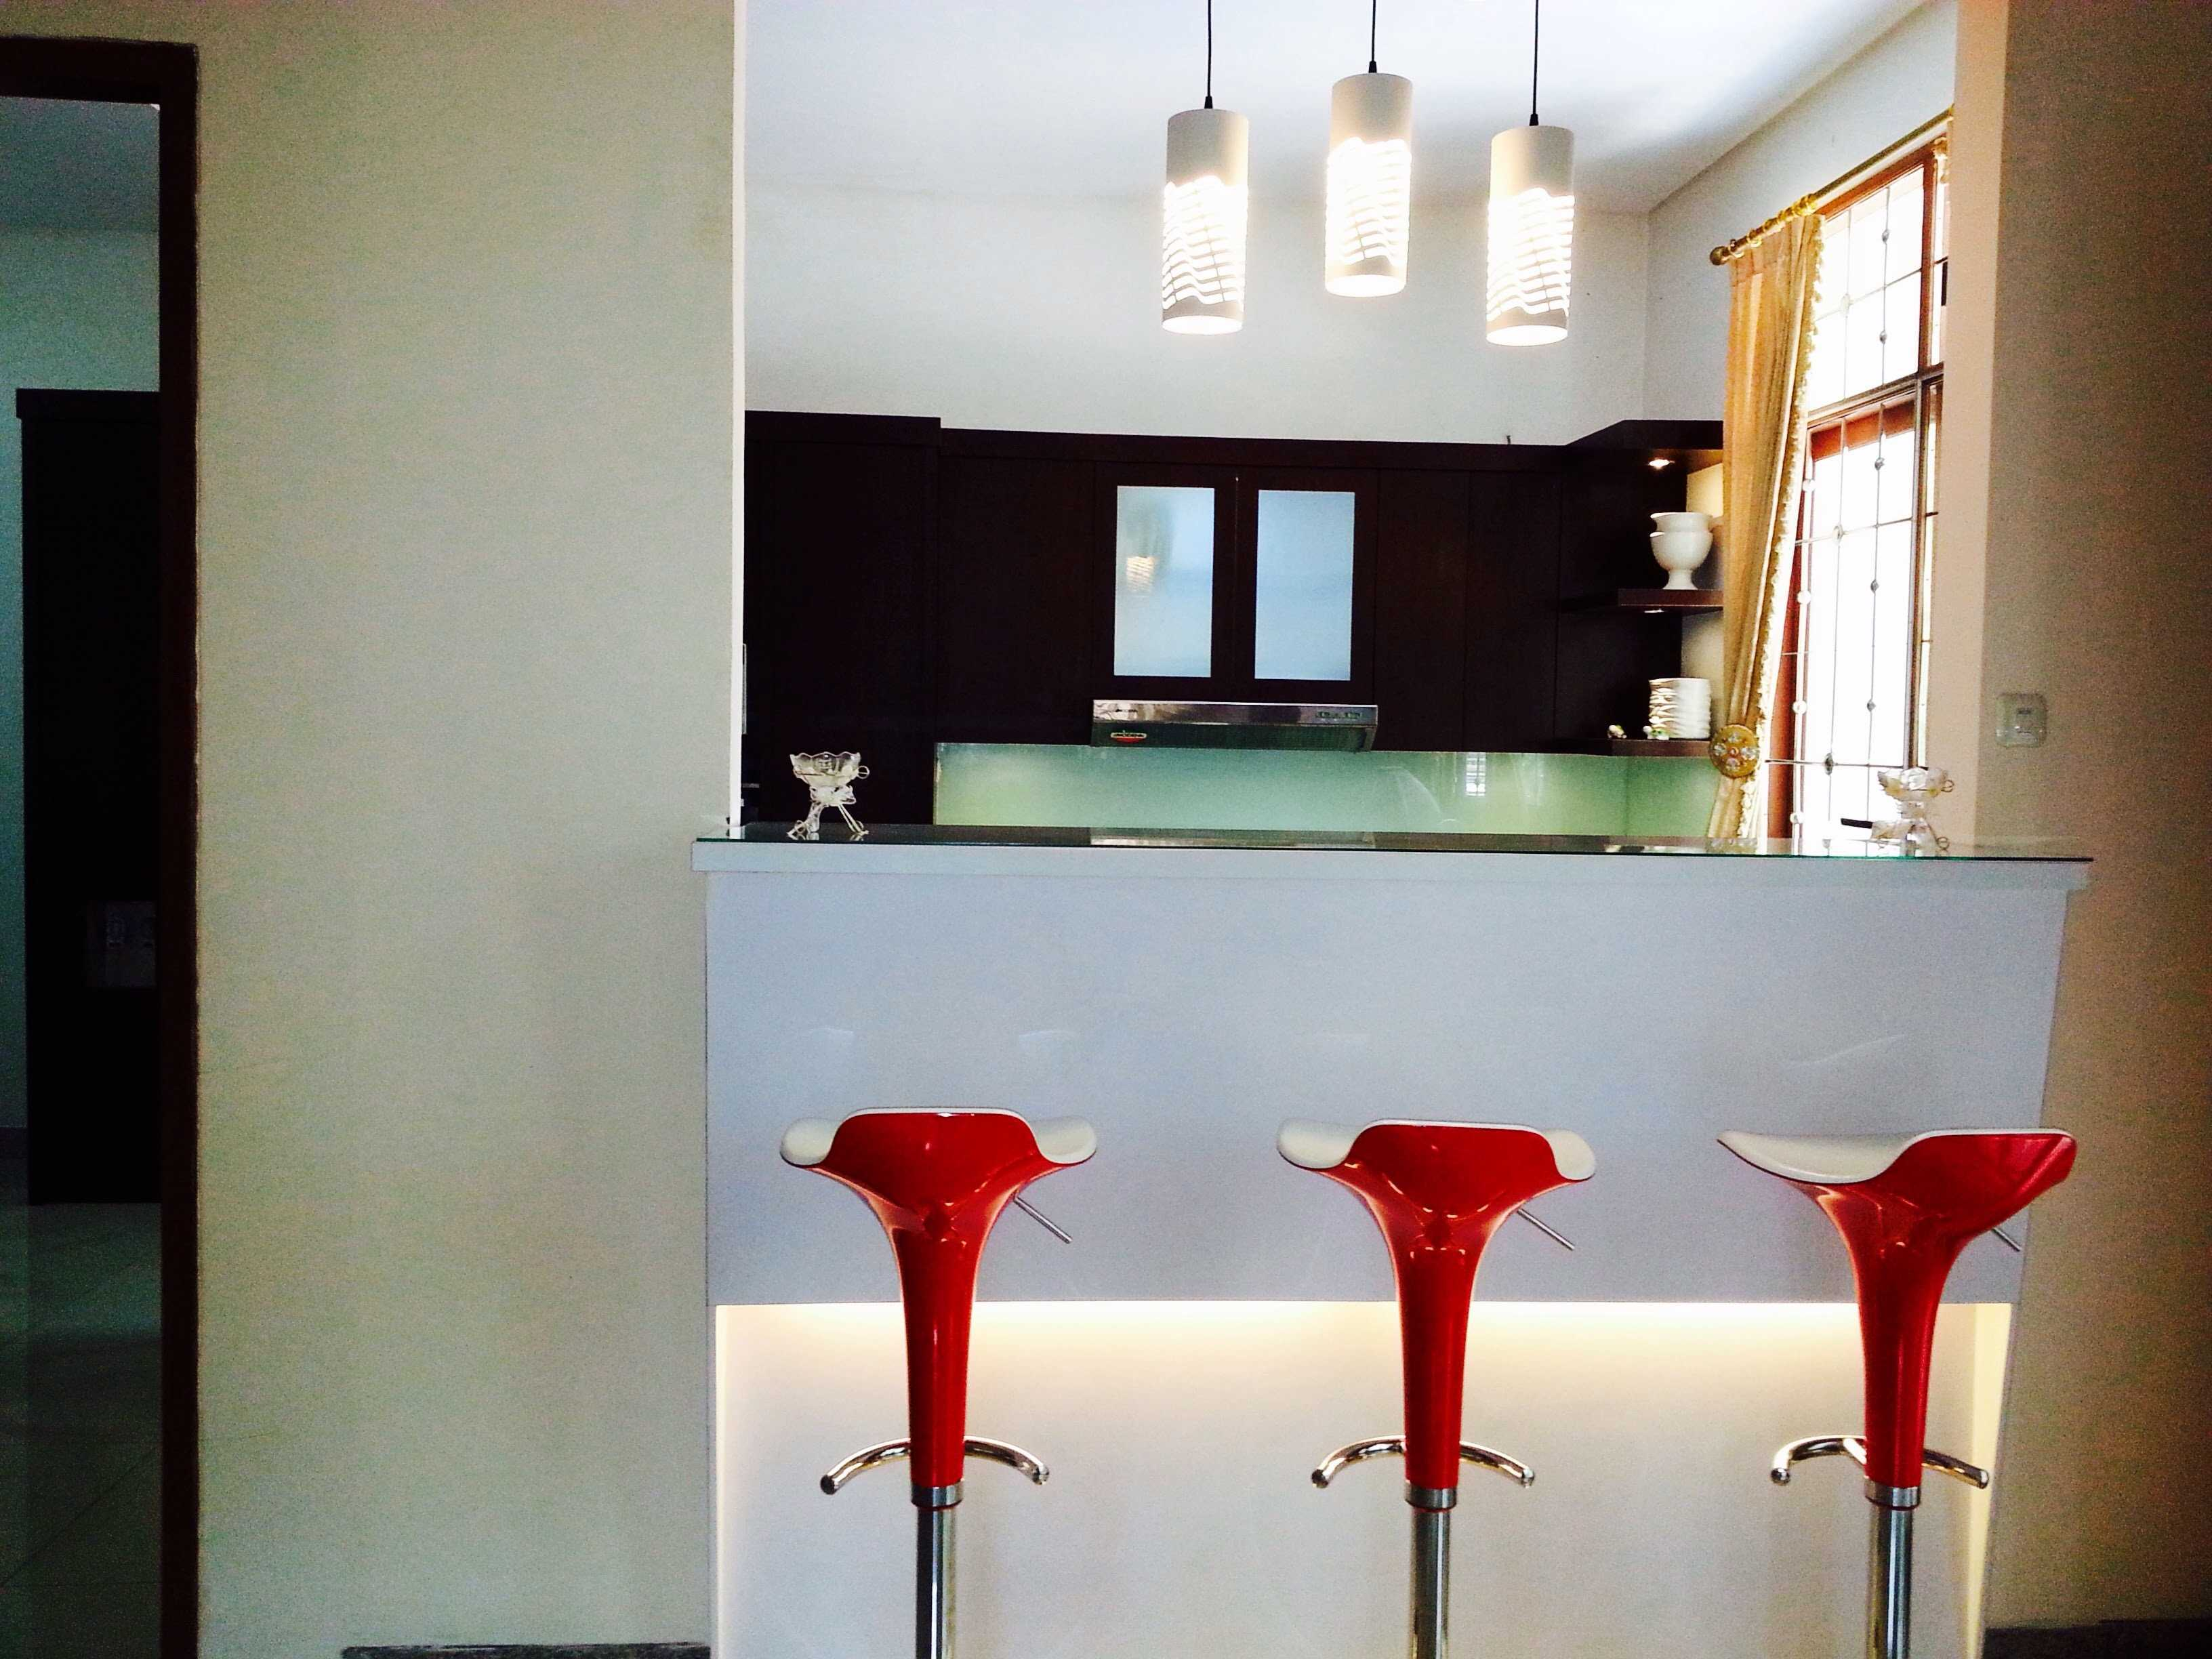 R-E Design Rumah Tinggal Depok Depok Kitchen   25155